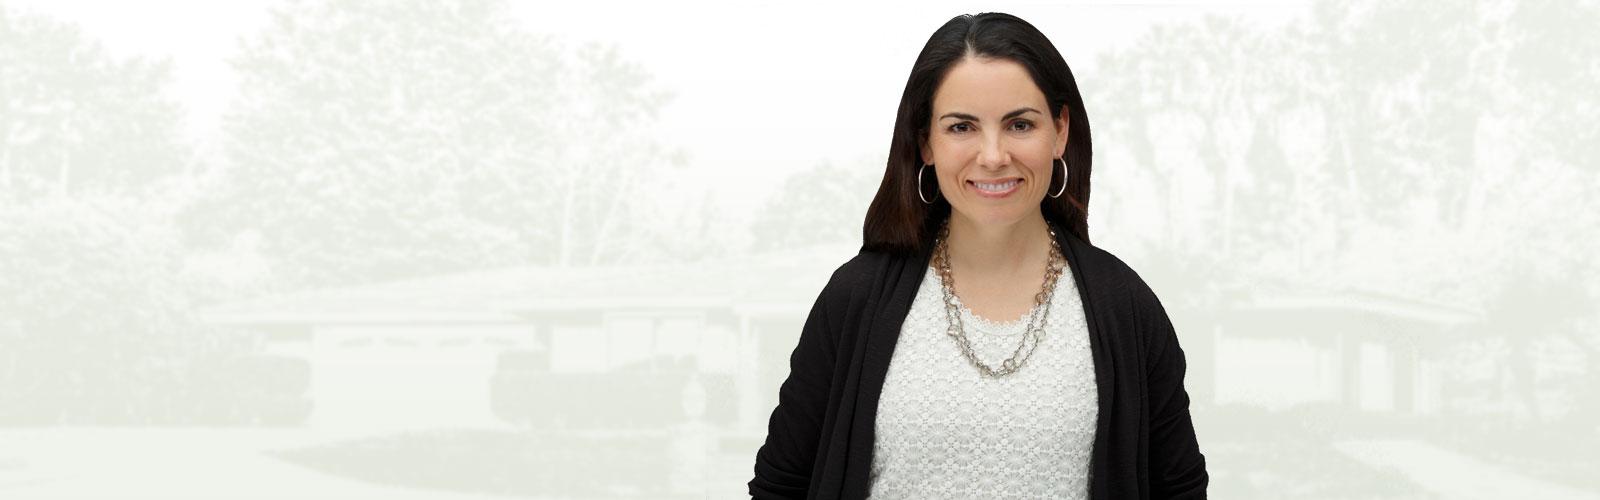 North County San Diego Real Estate Advisor